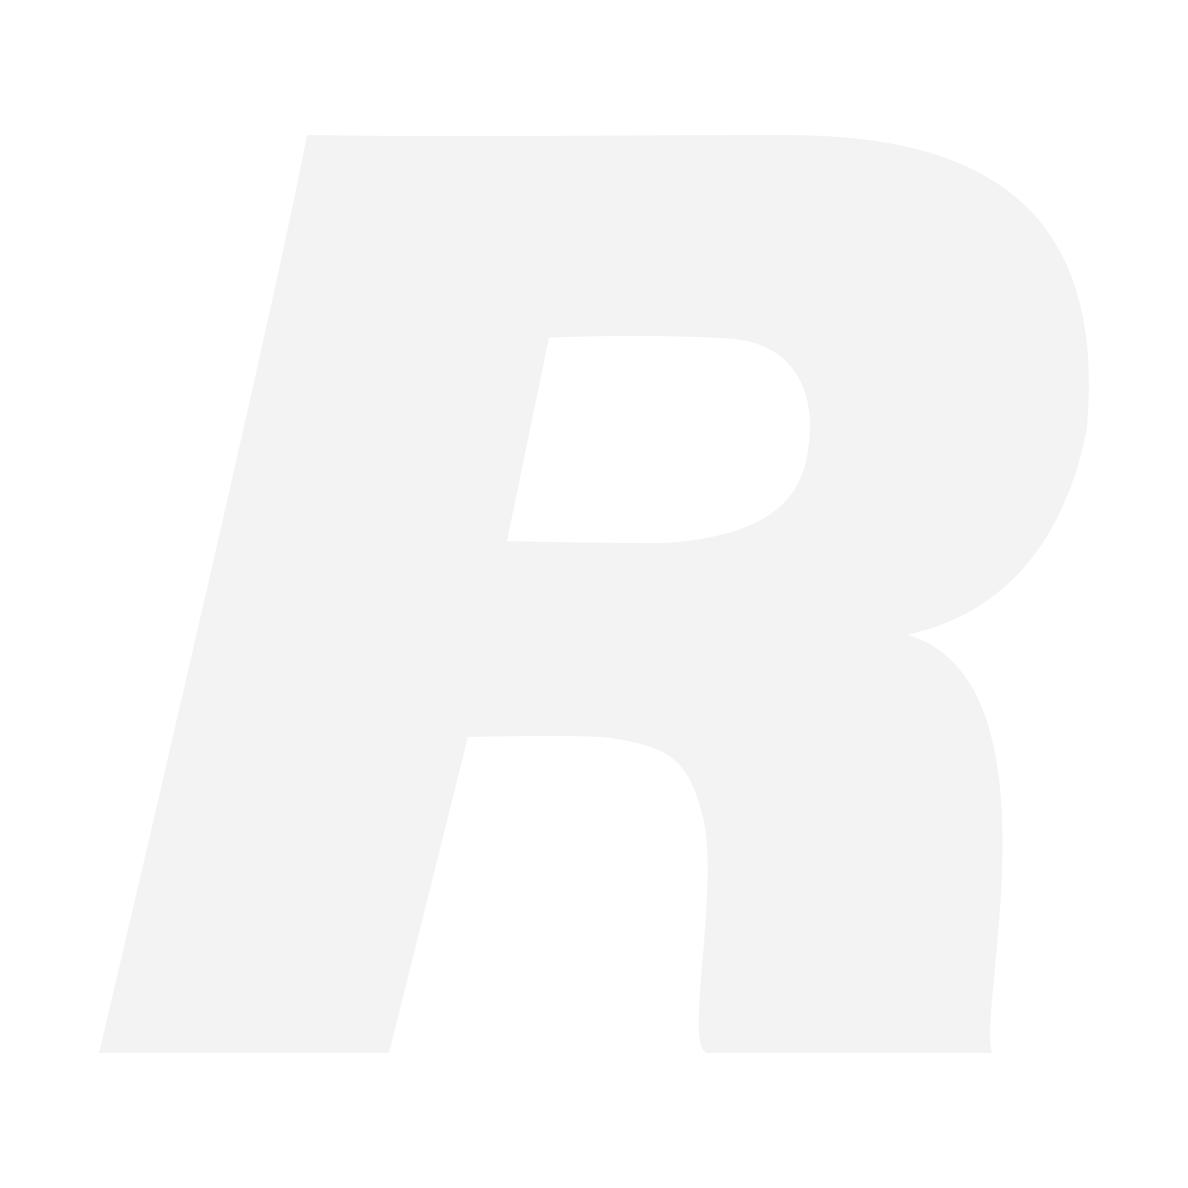 Leica Protector -nahkakotelo, ruskea (M10)